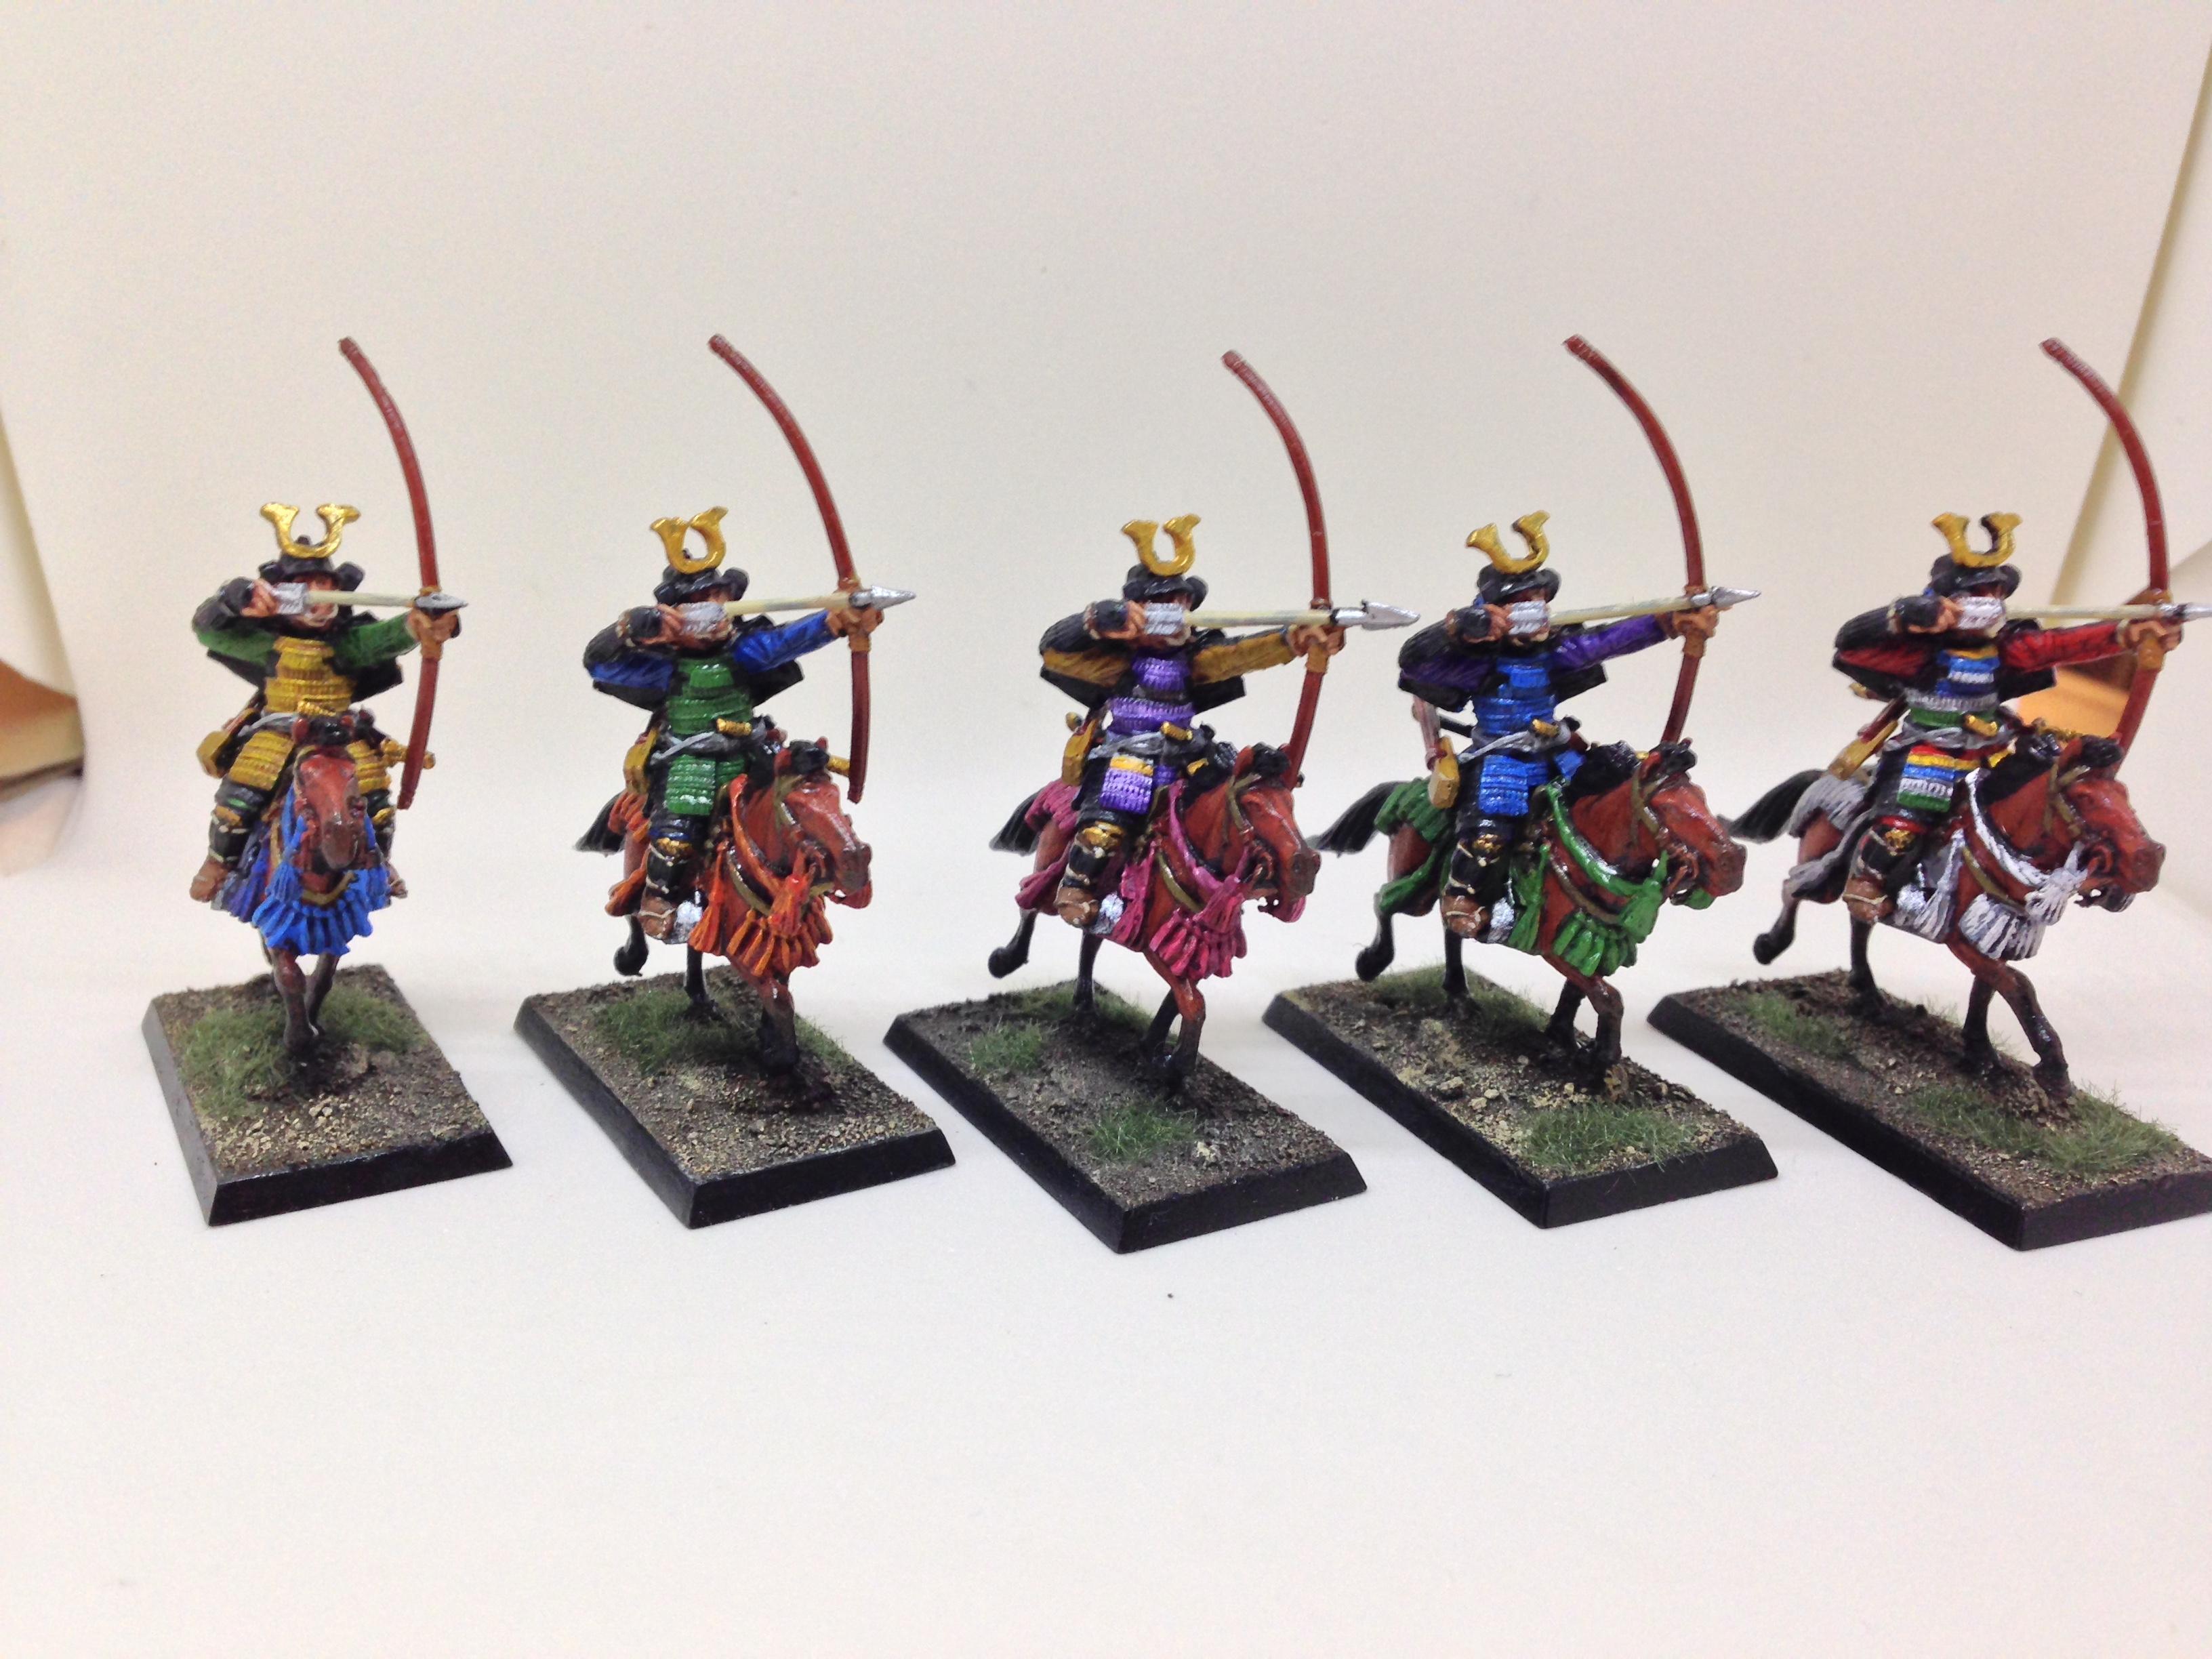 Archers, Cavalry, Kingsford, Samurai